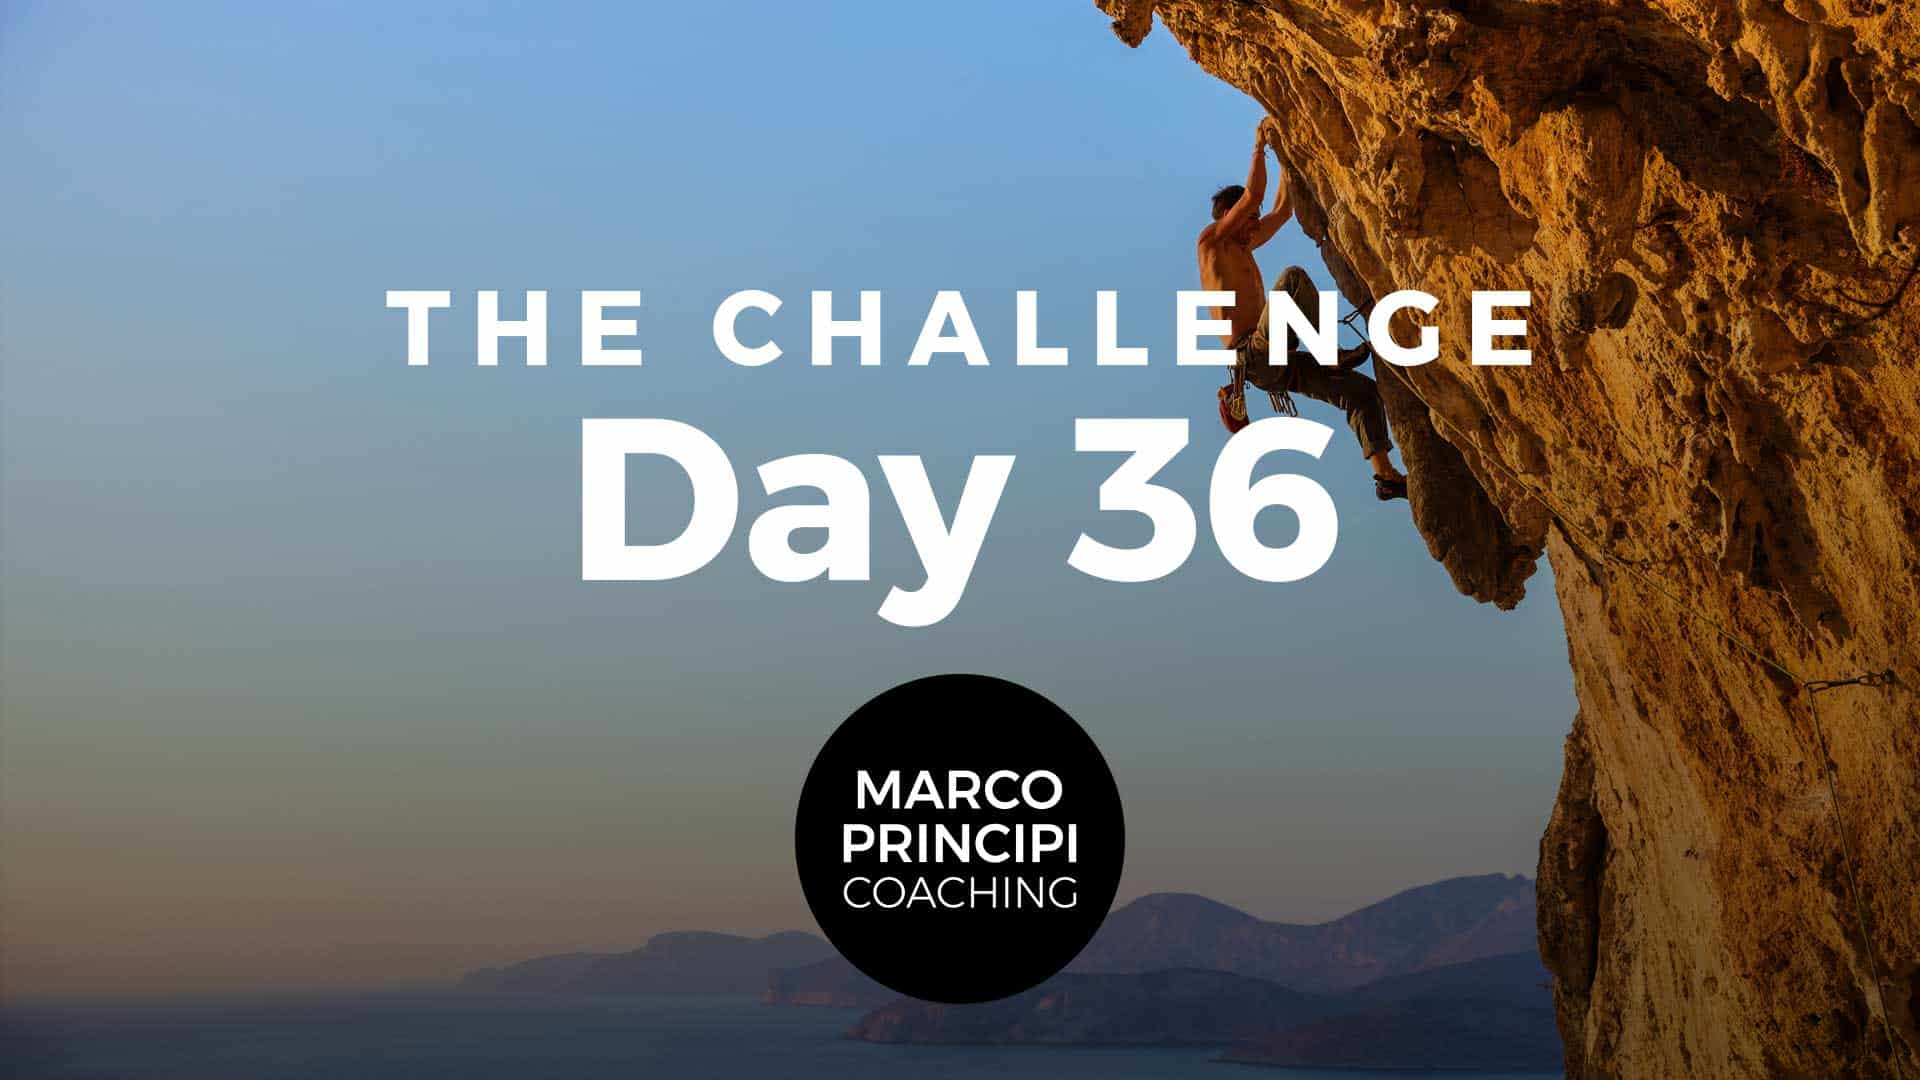 Marco Principi The Challenge Day 036